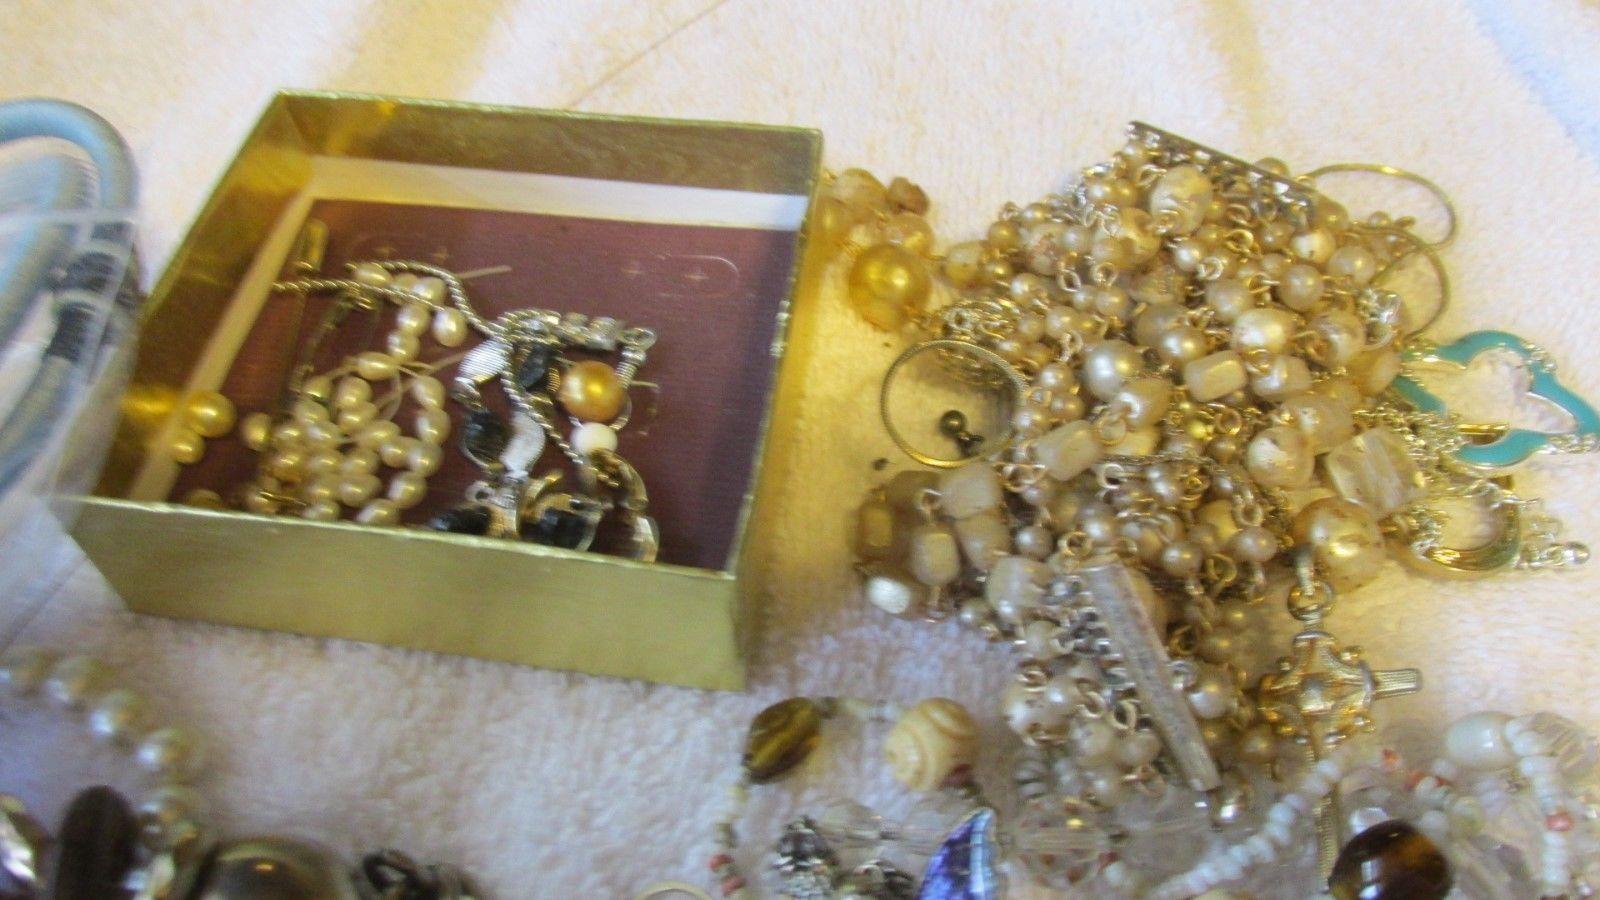 SAGE Found Object/Junk Box Jewelry